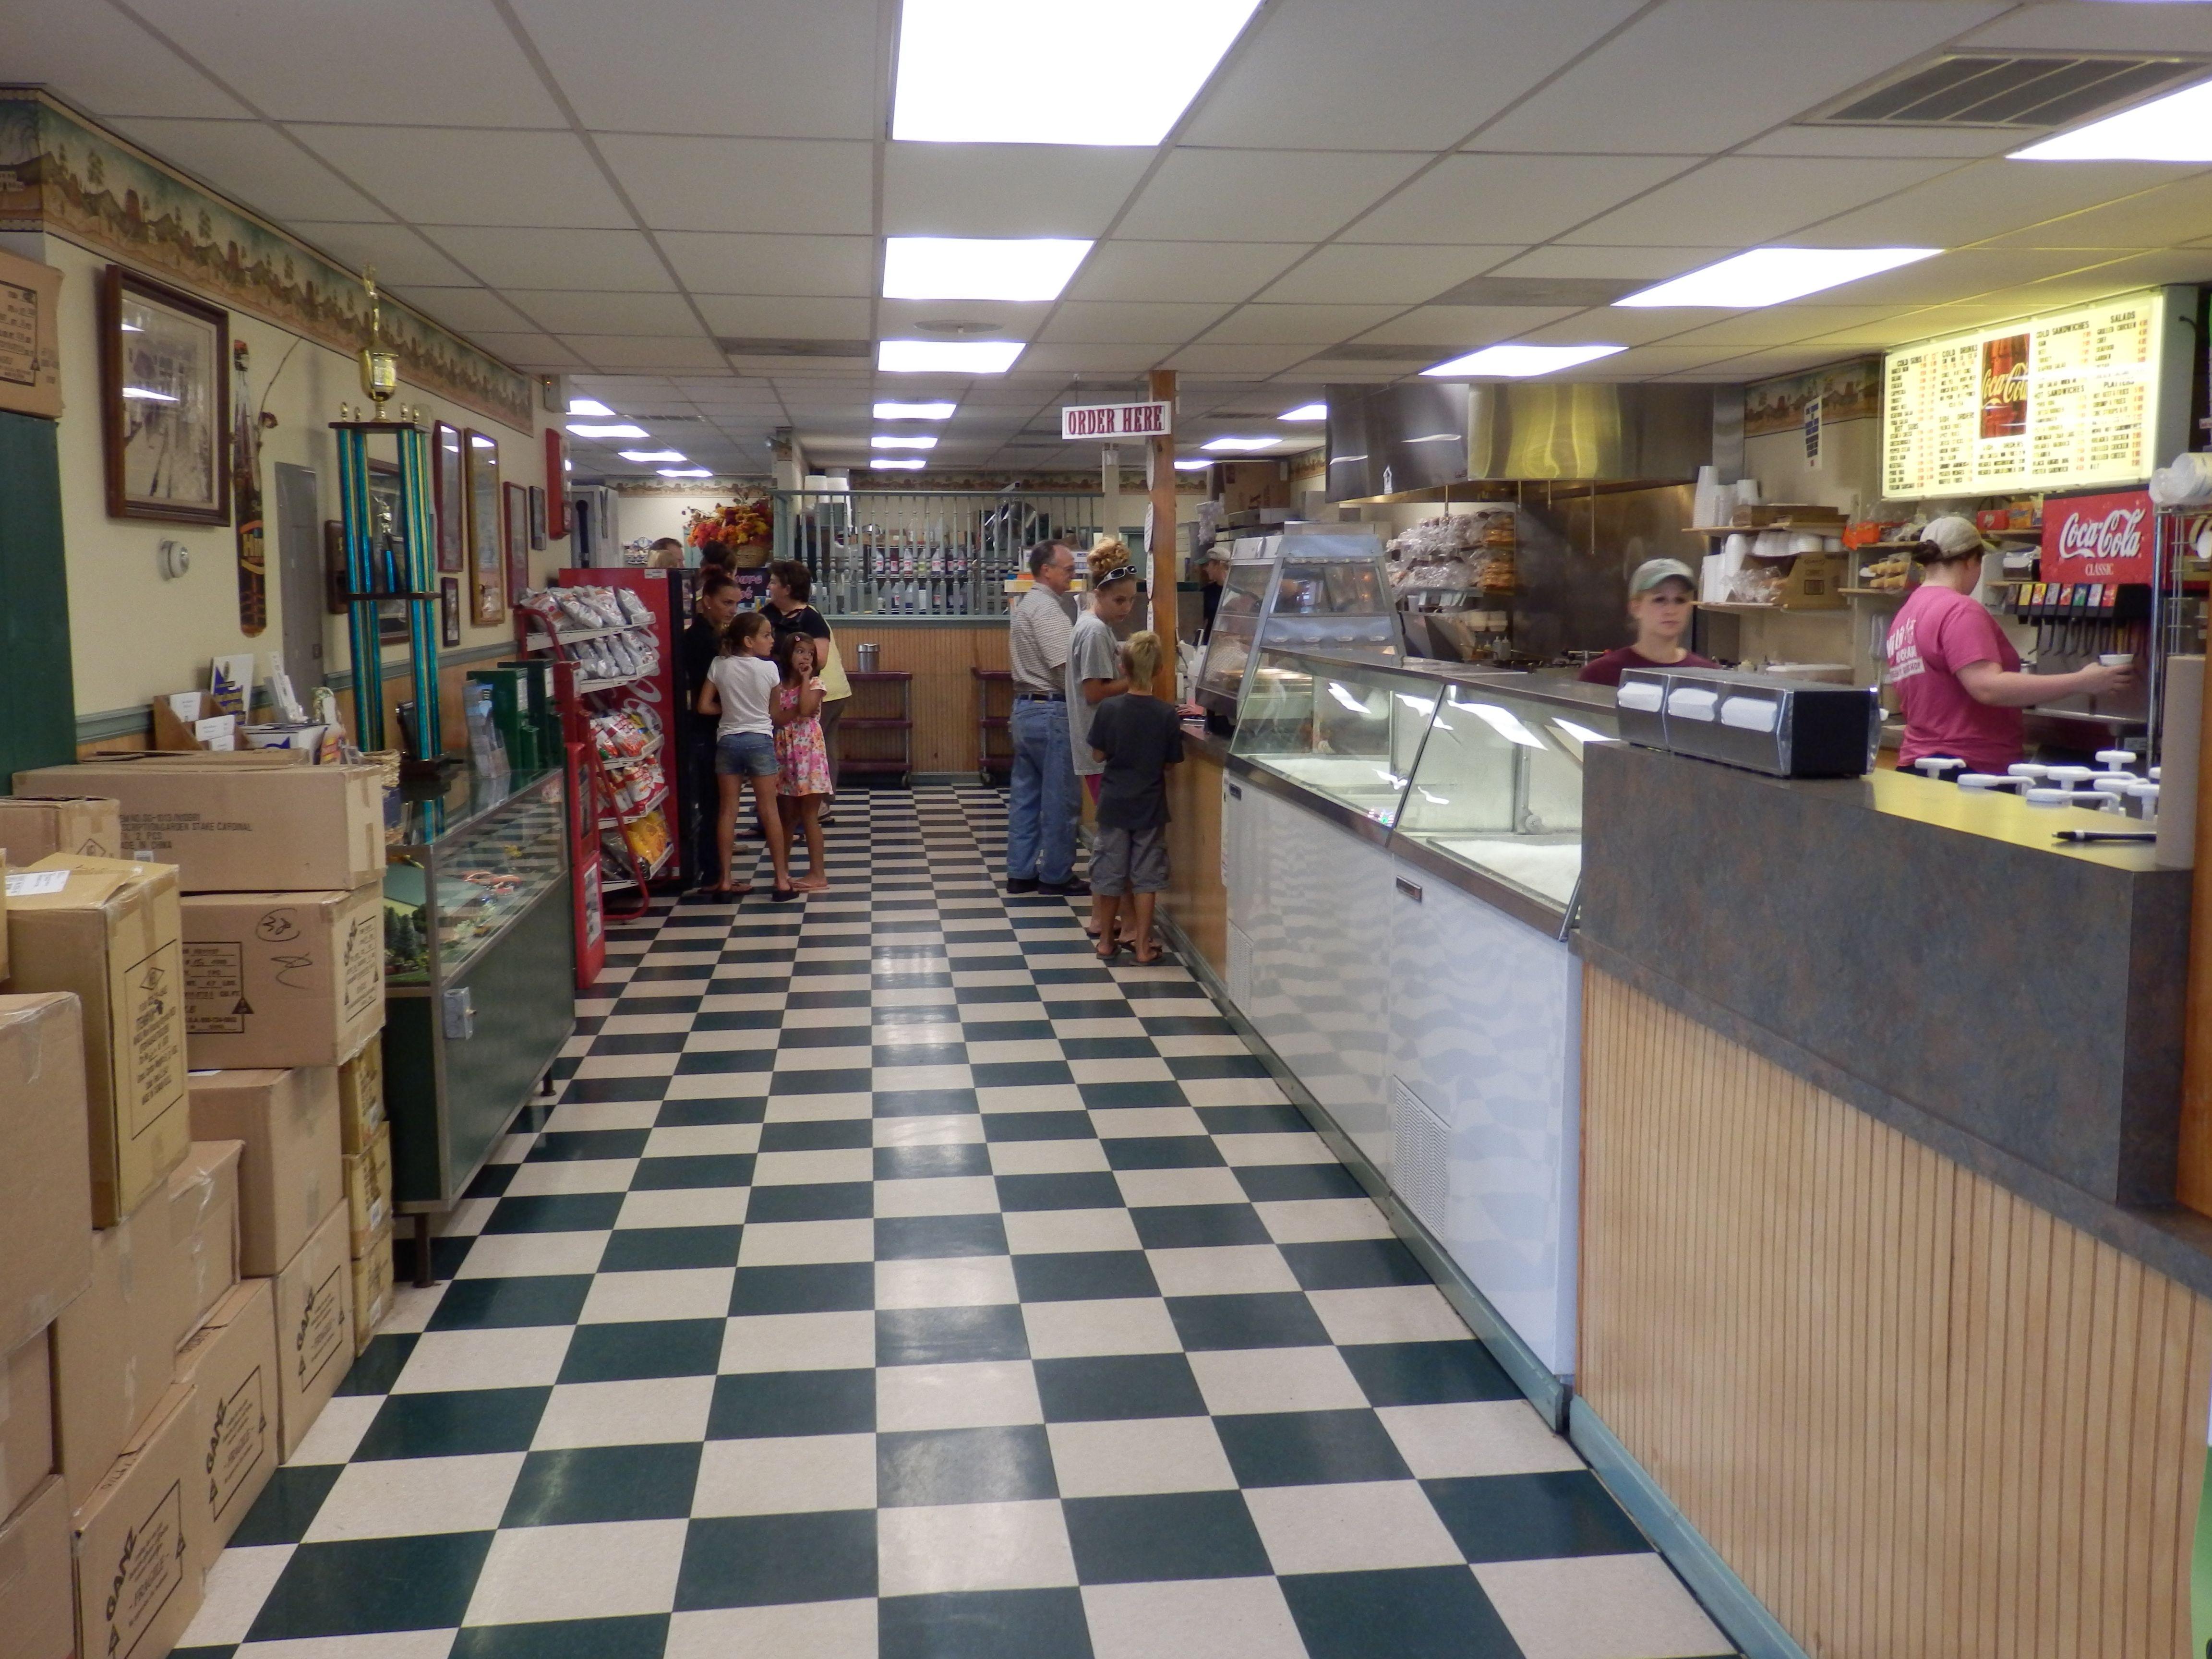 greencastle, pa - mikie's ice cream shop has counter service where